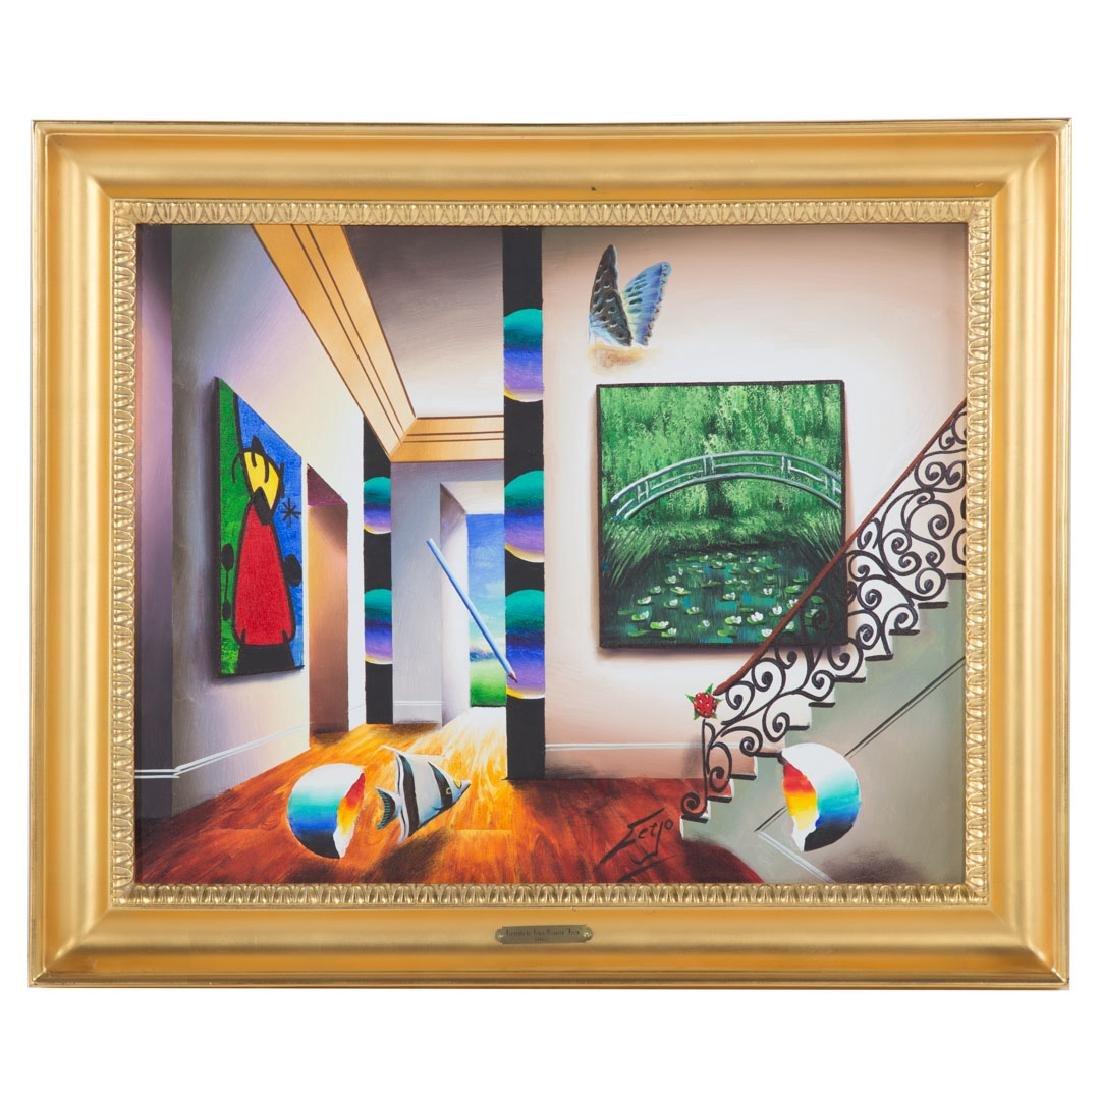 Ferjo. Surrealist Interior with Monet and Miro